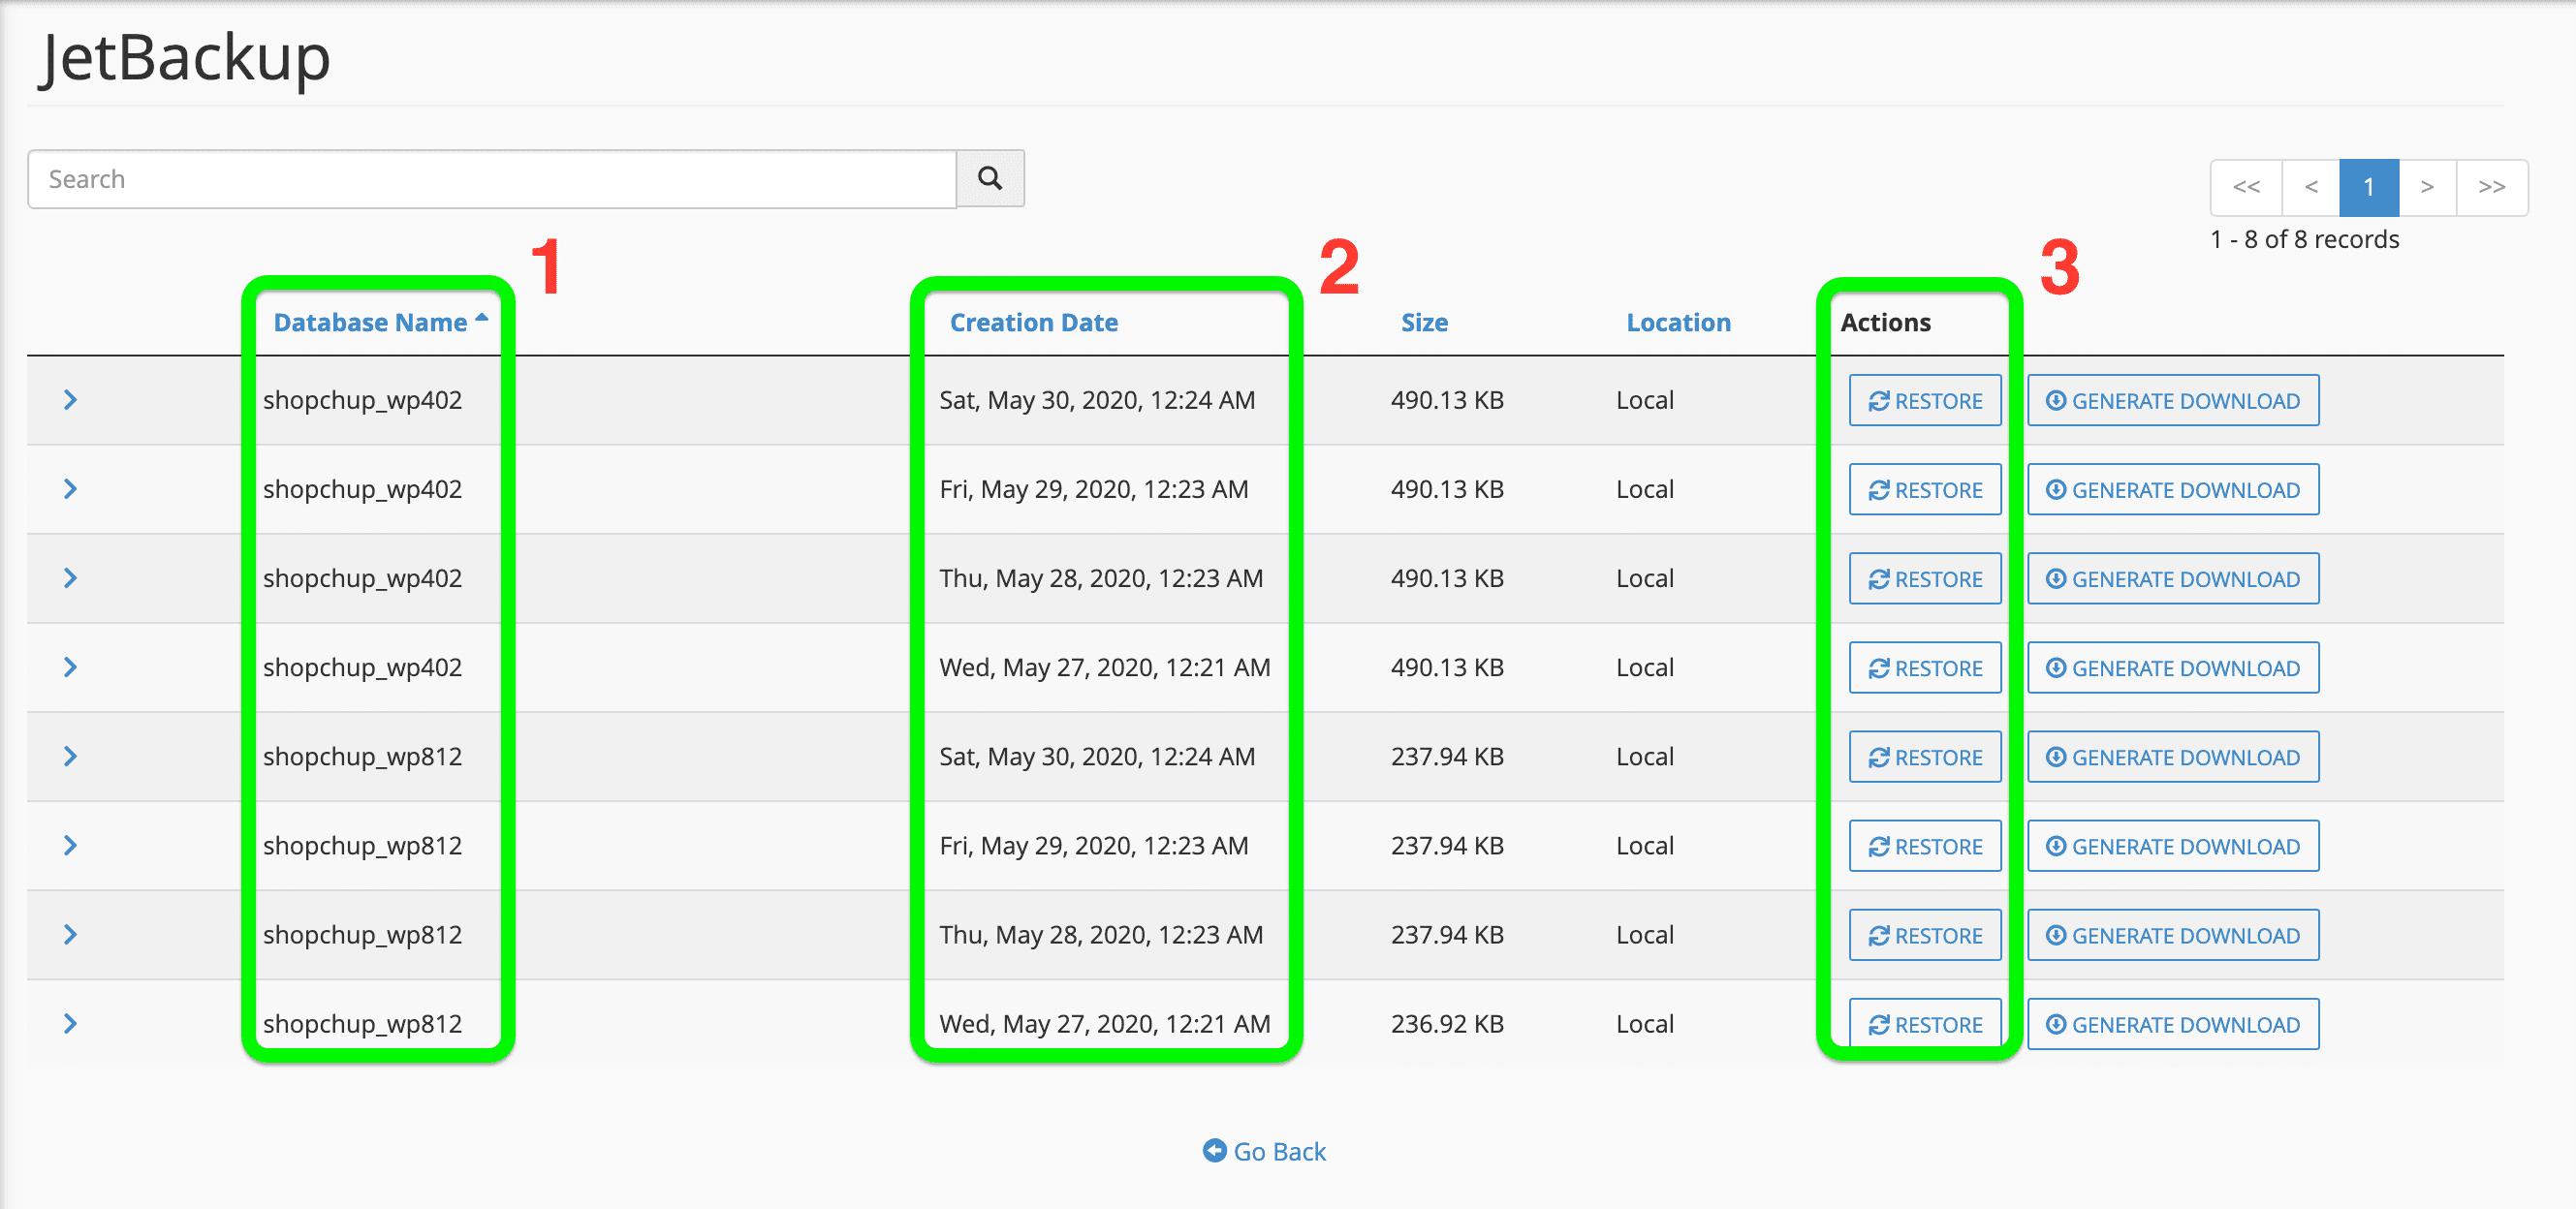 Giao diện Database Backups của Jetbackup